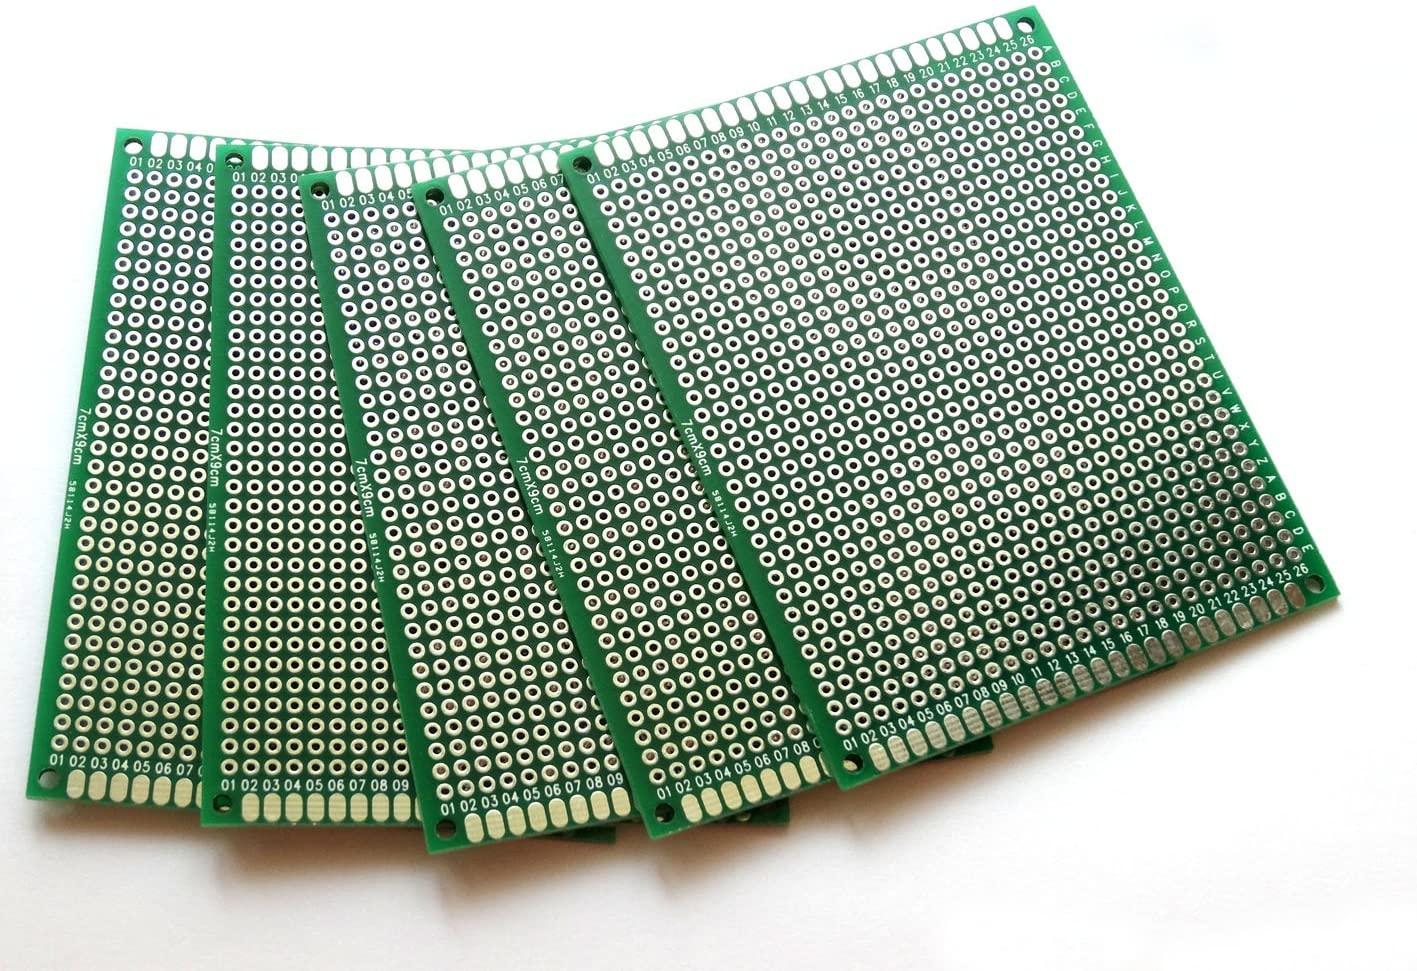 Penta Angel 10pcs Double-Side Prototype PCB Universal Printed Circuit Board Universal PCB Circuit Board (7x9cm)